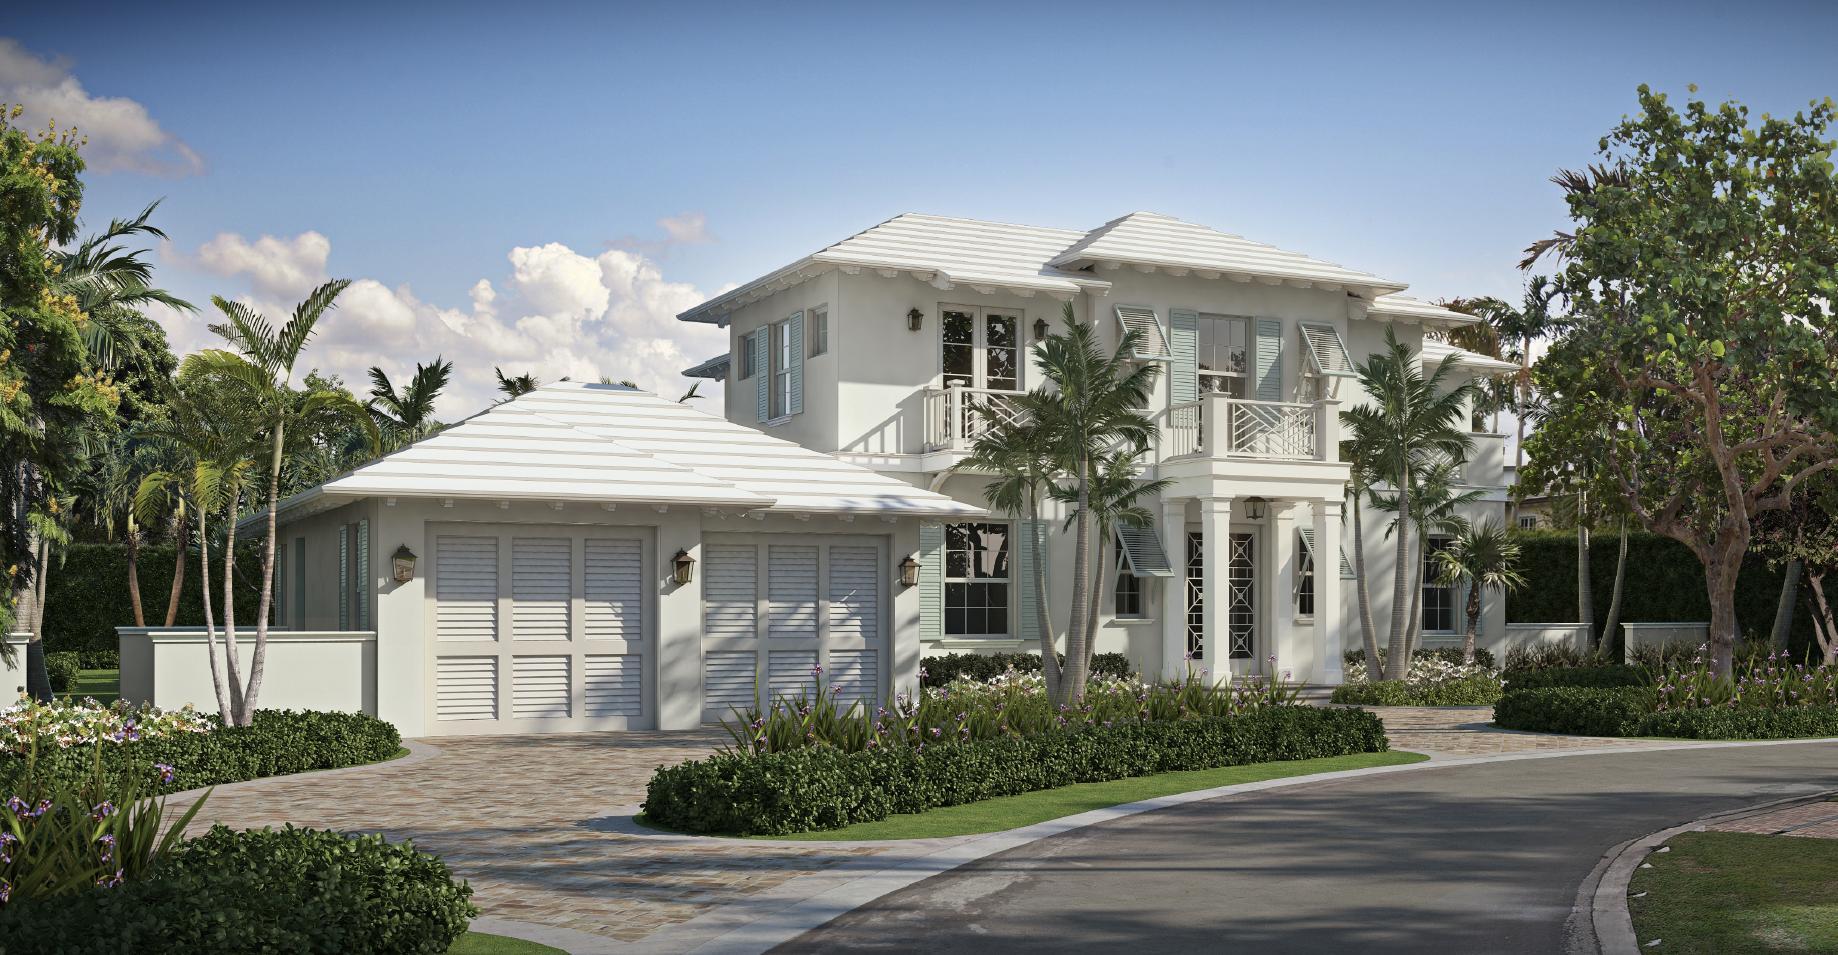 Photo of 214 Plantation Road, Palm Beach, FL 33480